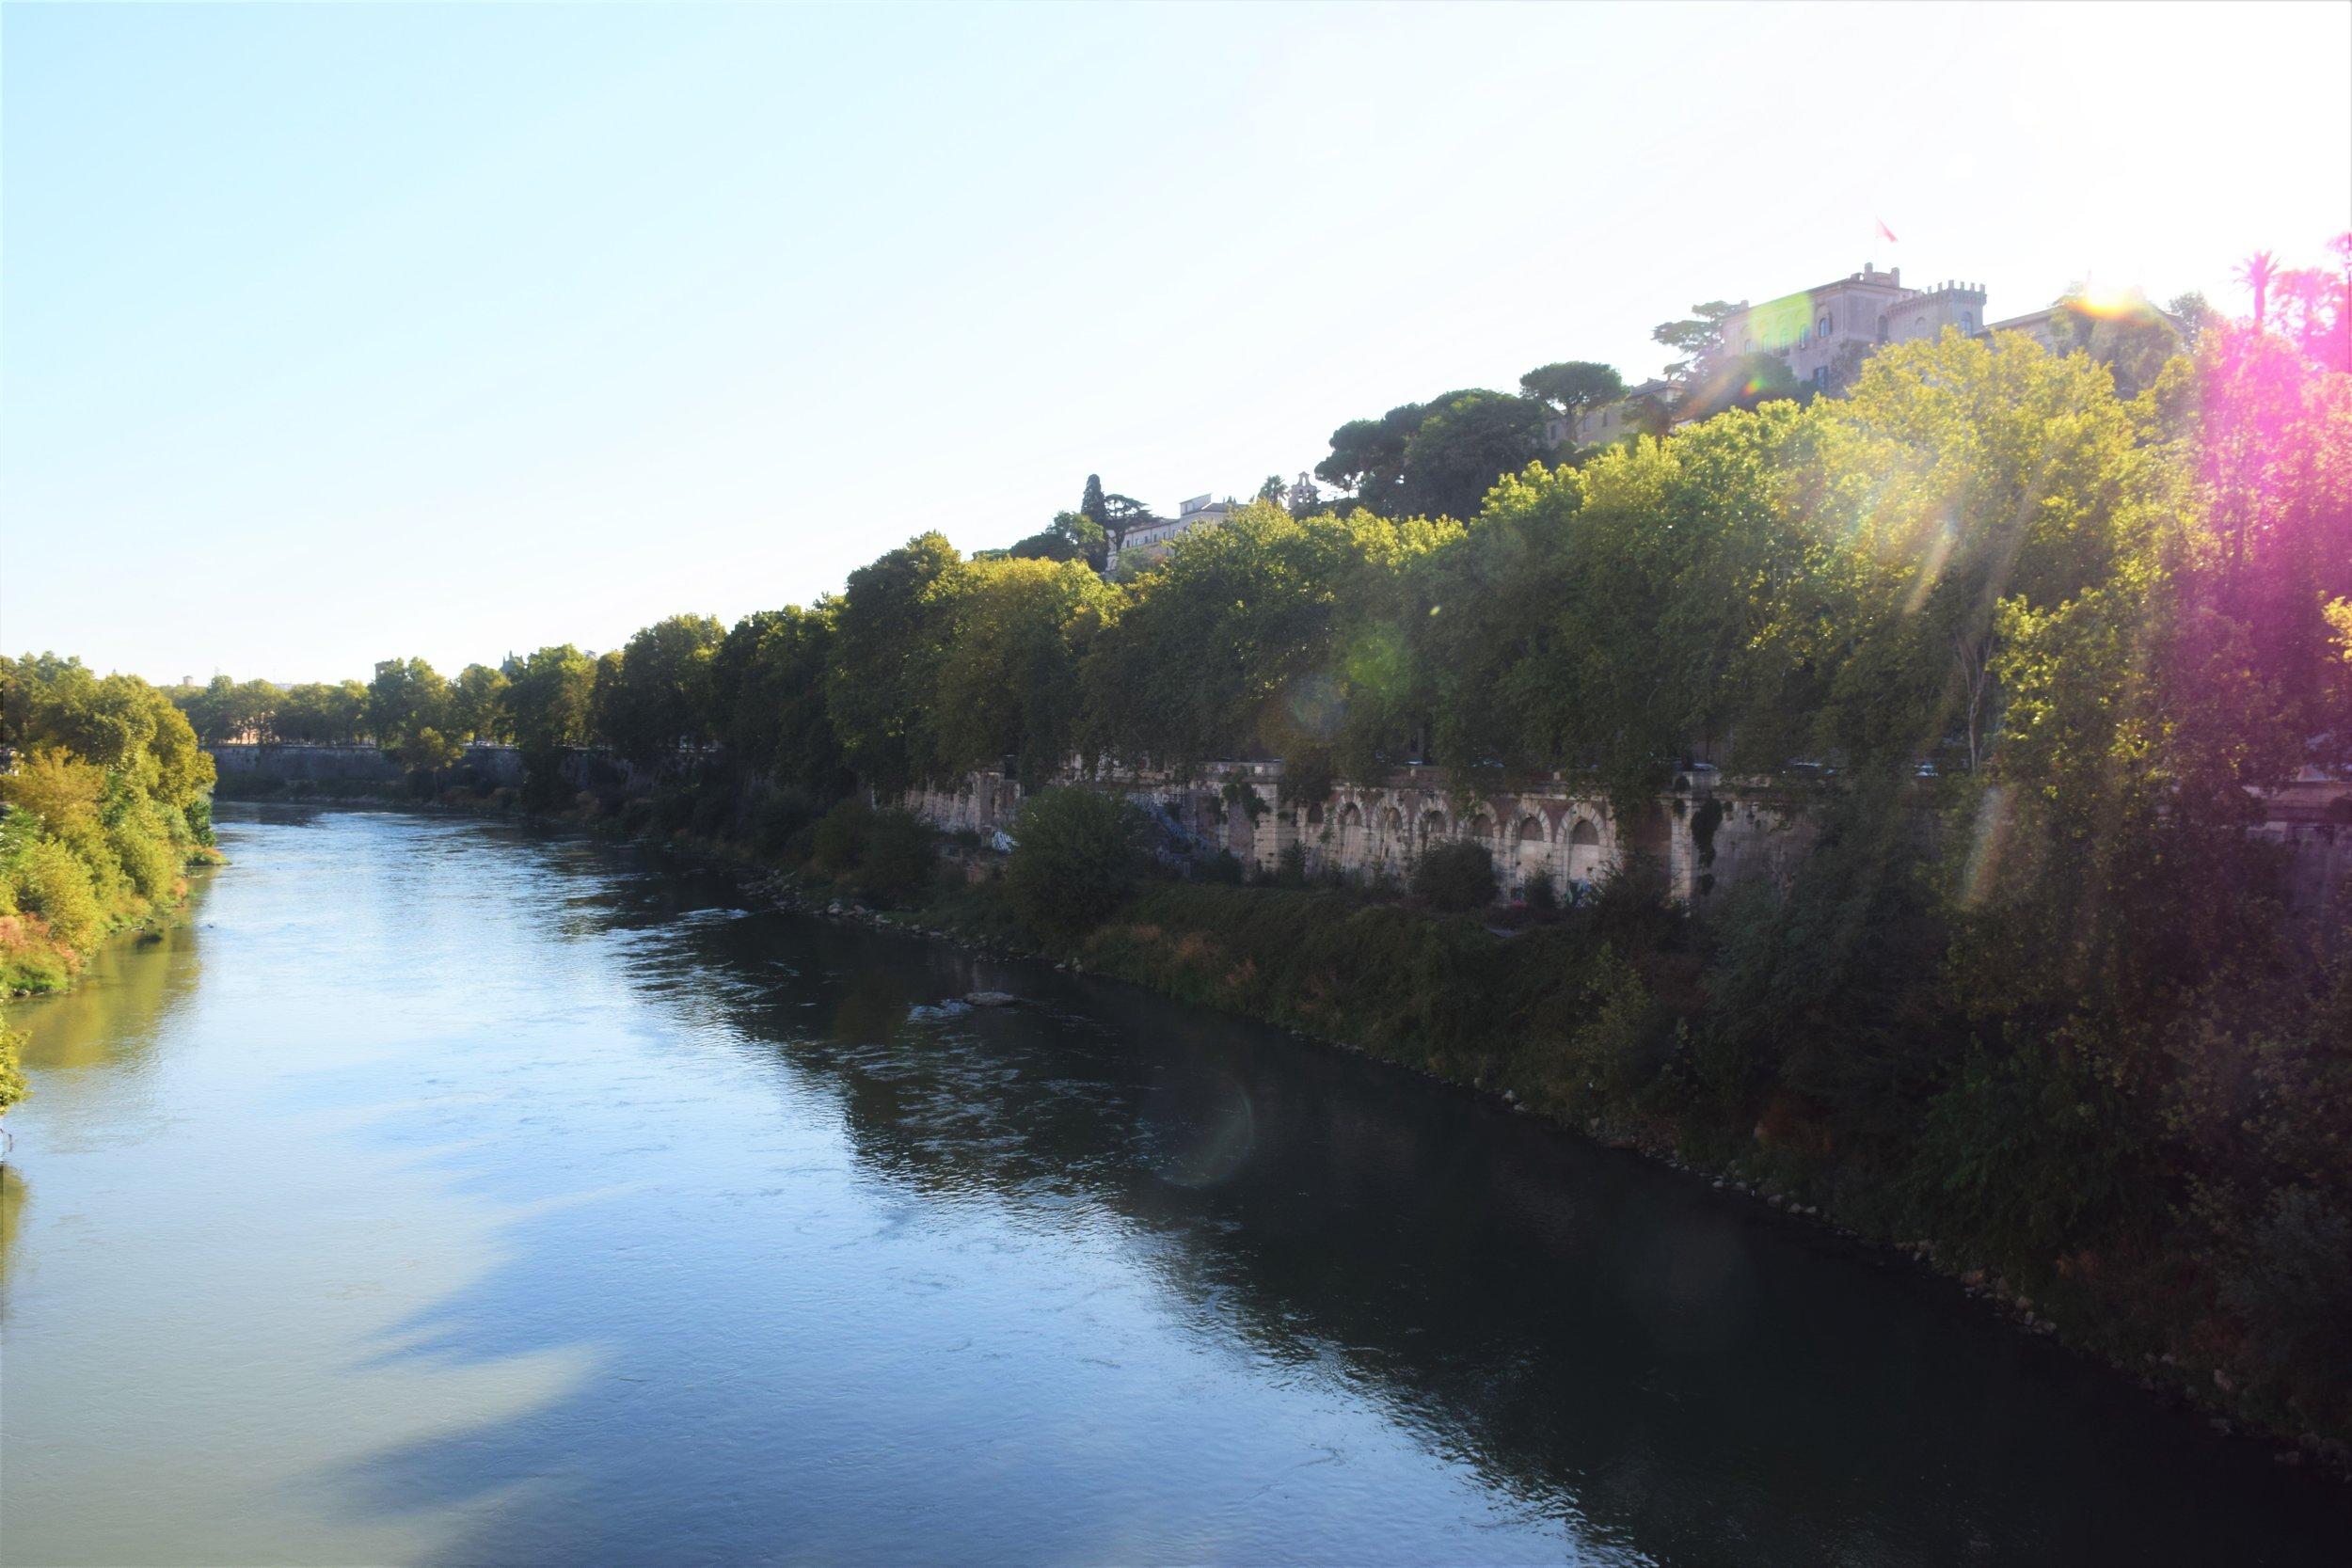 Tiber River -